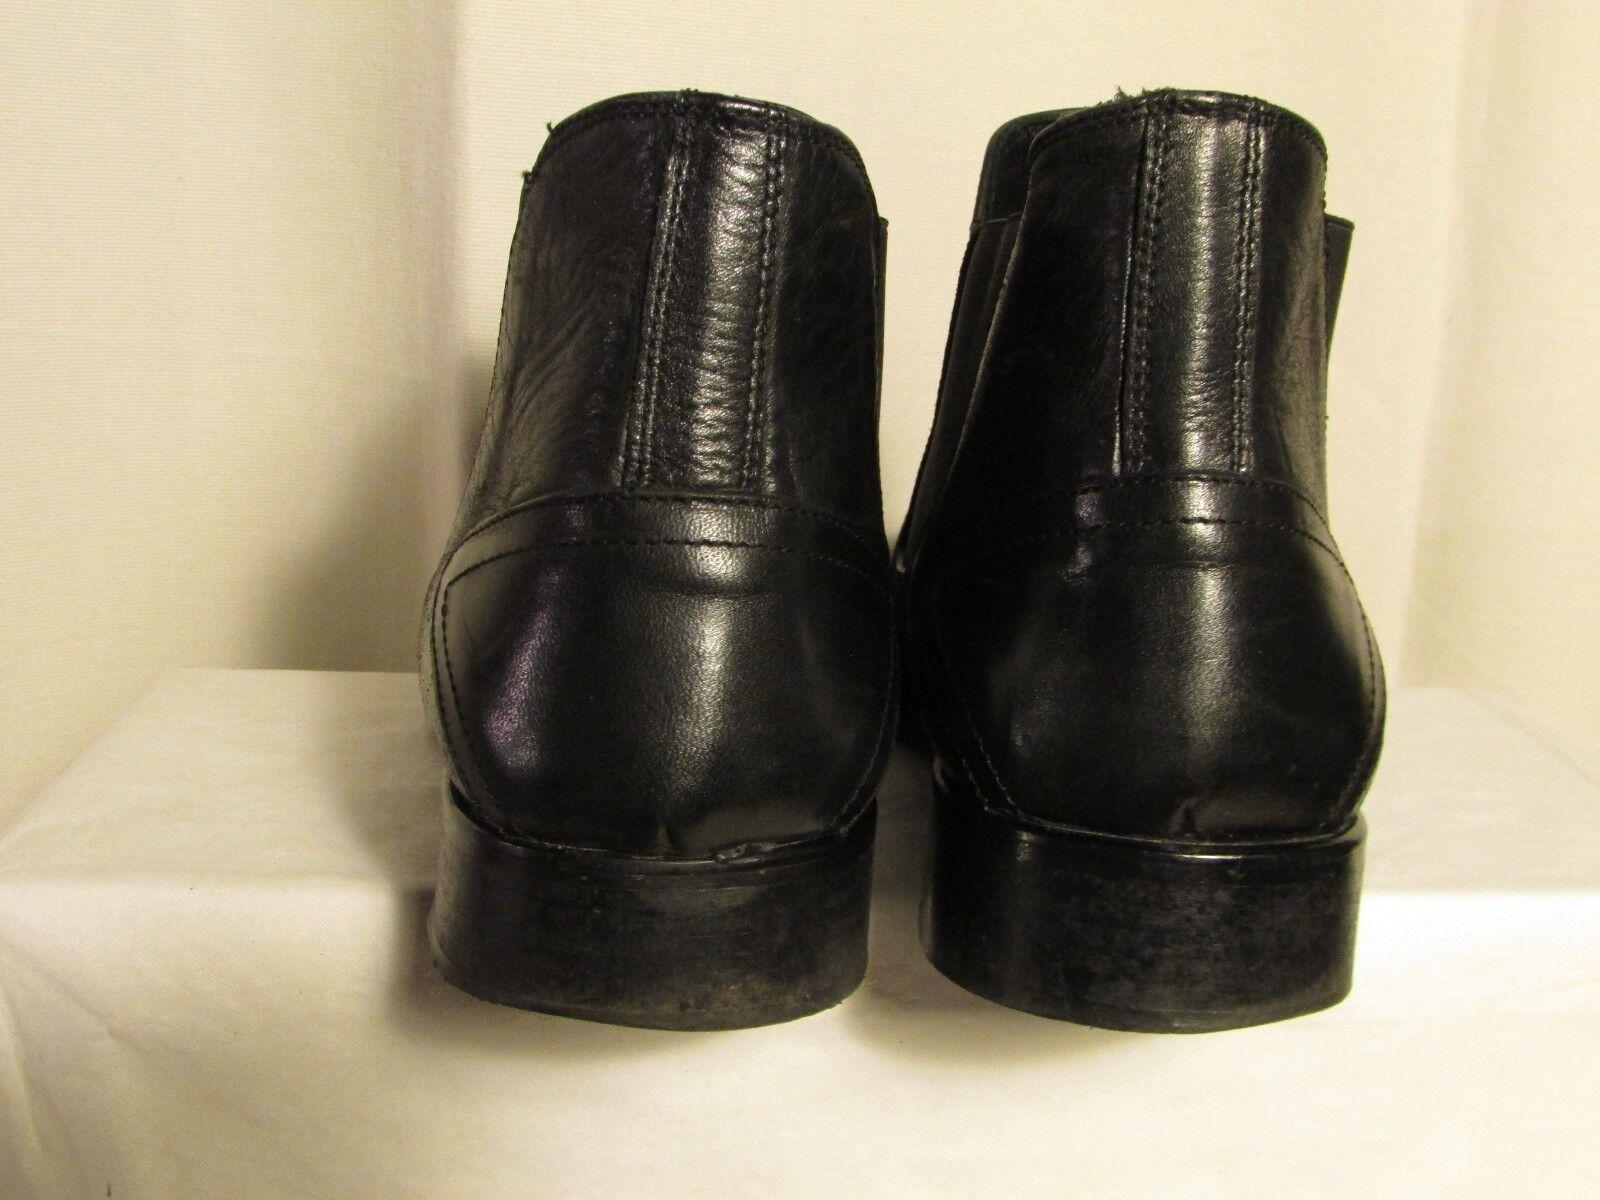 botas botines botines botines Vaqueros louis SCHERRER cuero negro número 45 d4ab1c